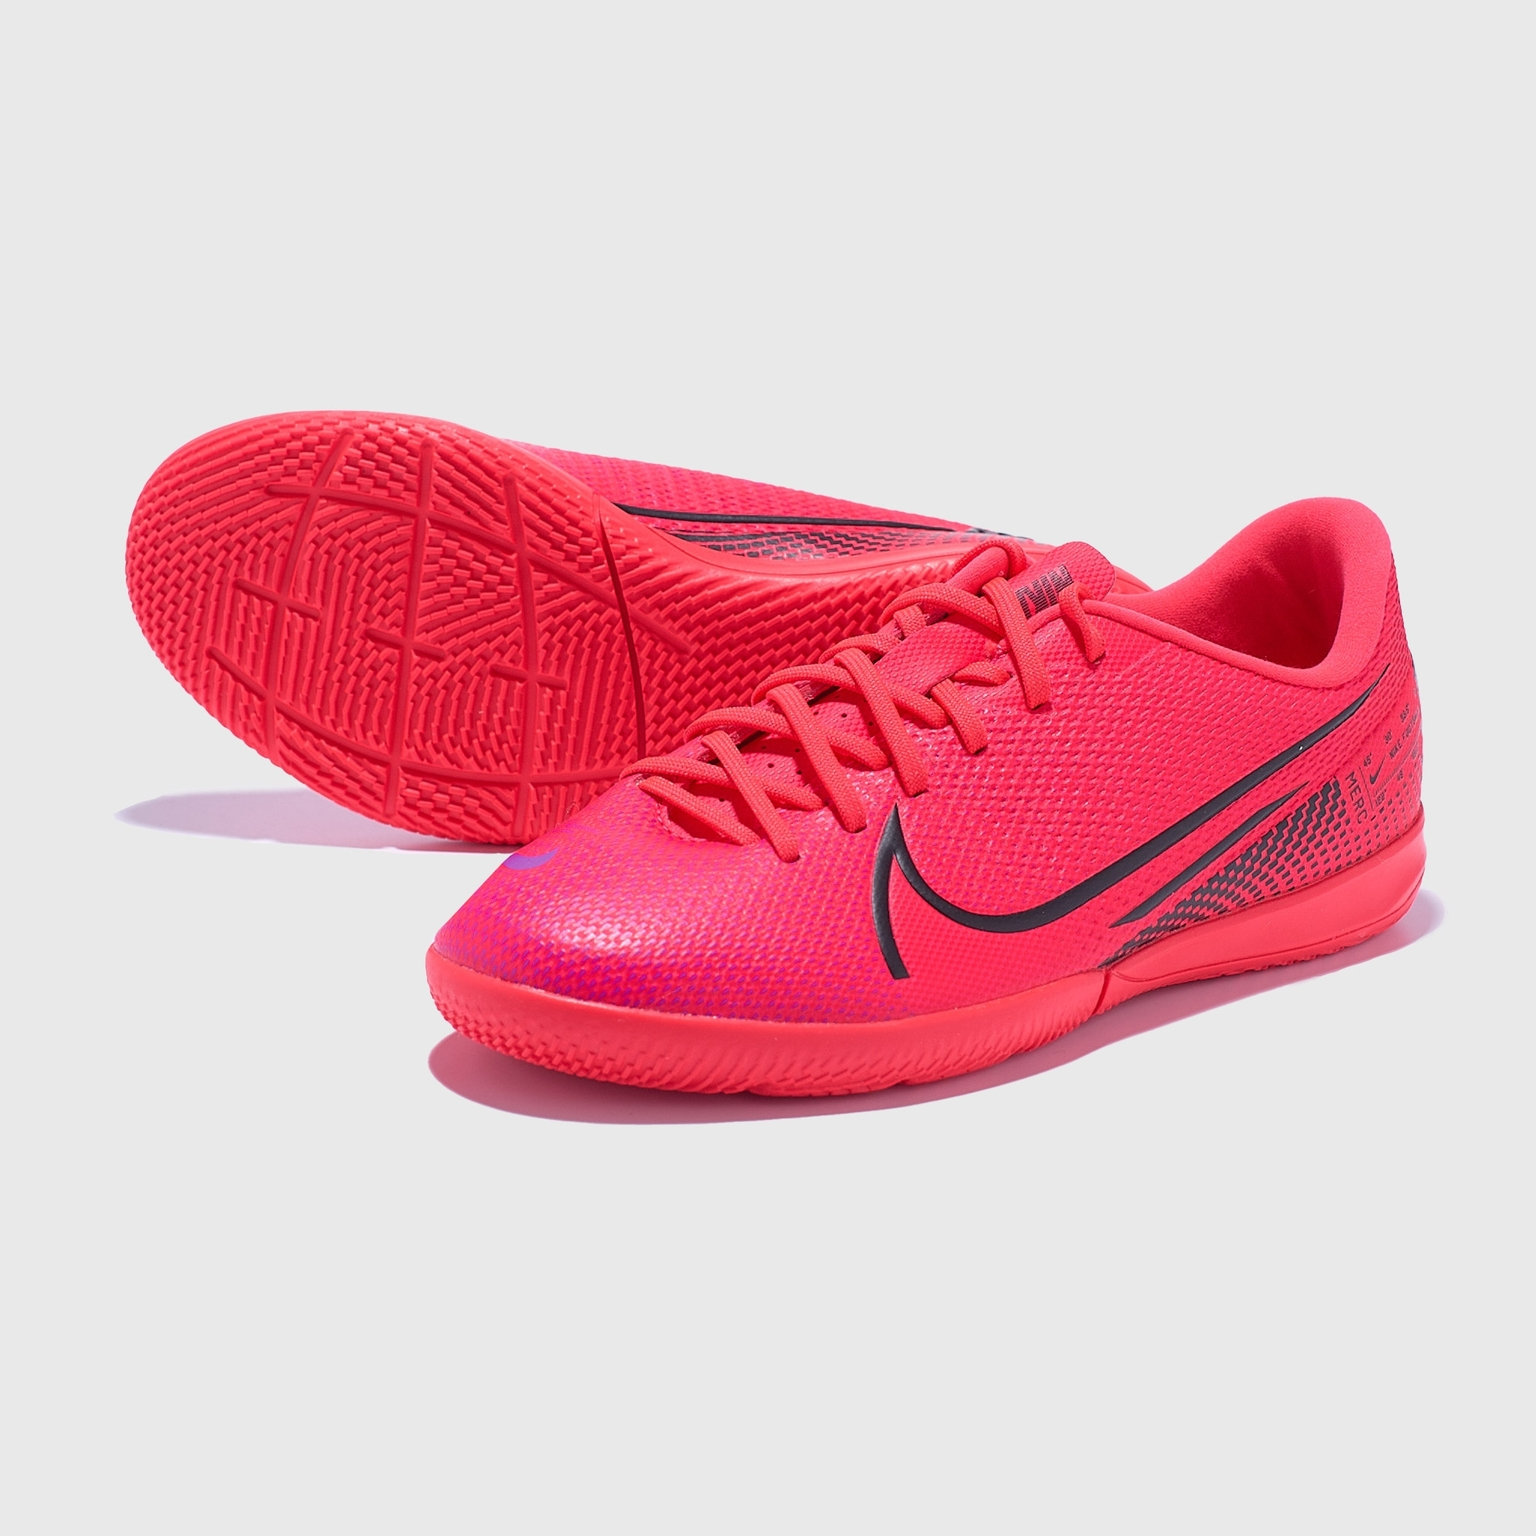 Футзалки детские Nike Vapor 13 Academy IC AT8137-606 футзалки детские nike legend 8 academy ic at5735 606